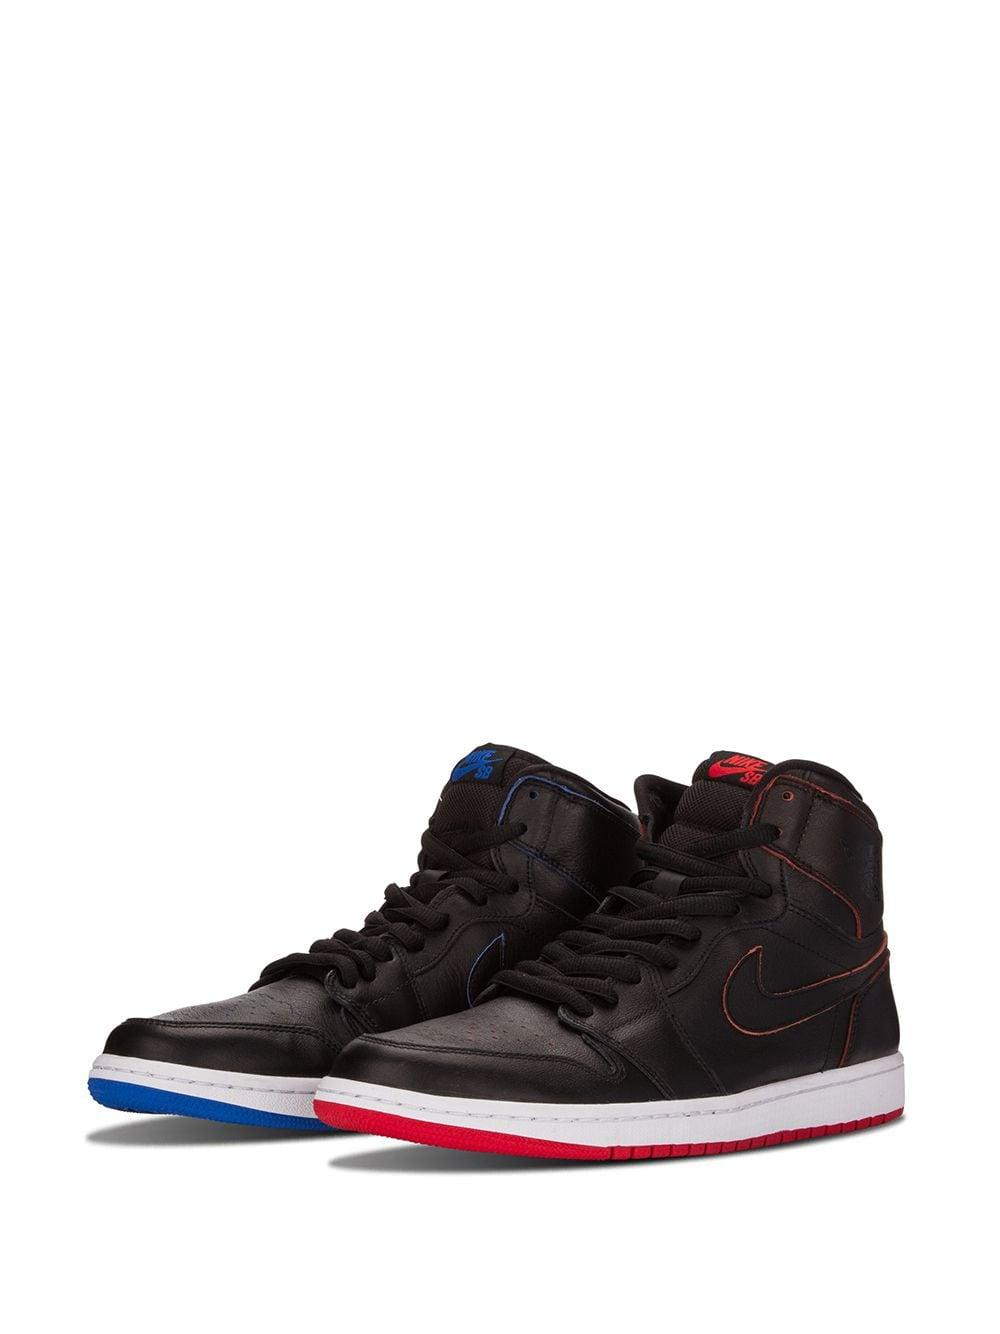 Zapatillas 1 SB QS Nike de hombre de color Negro